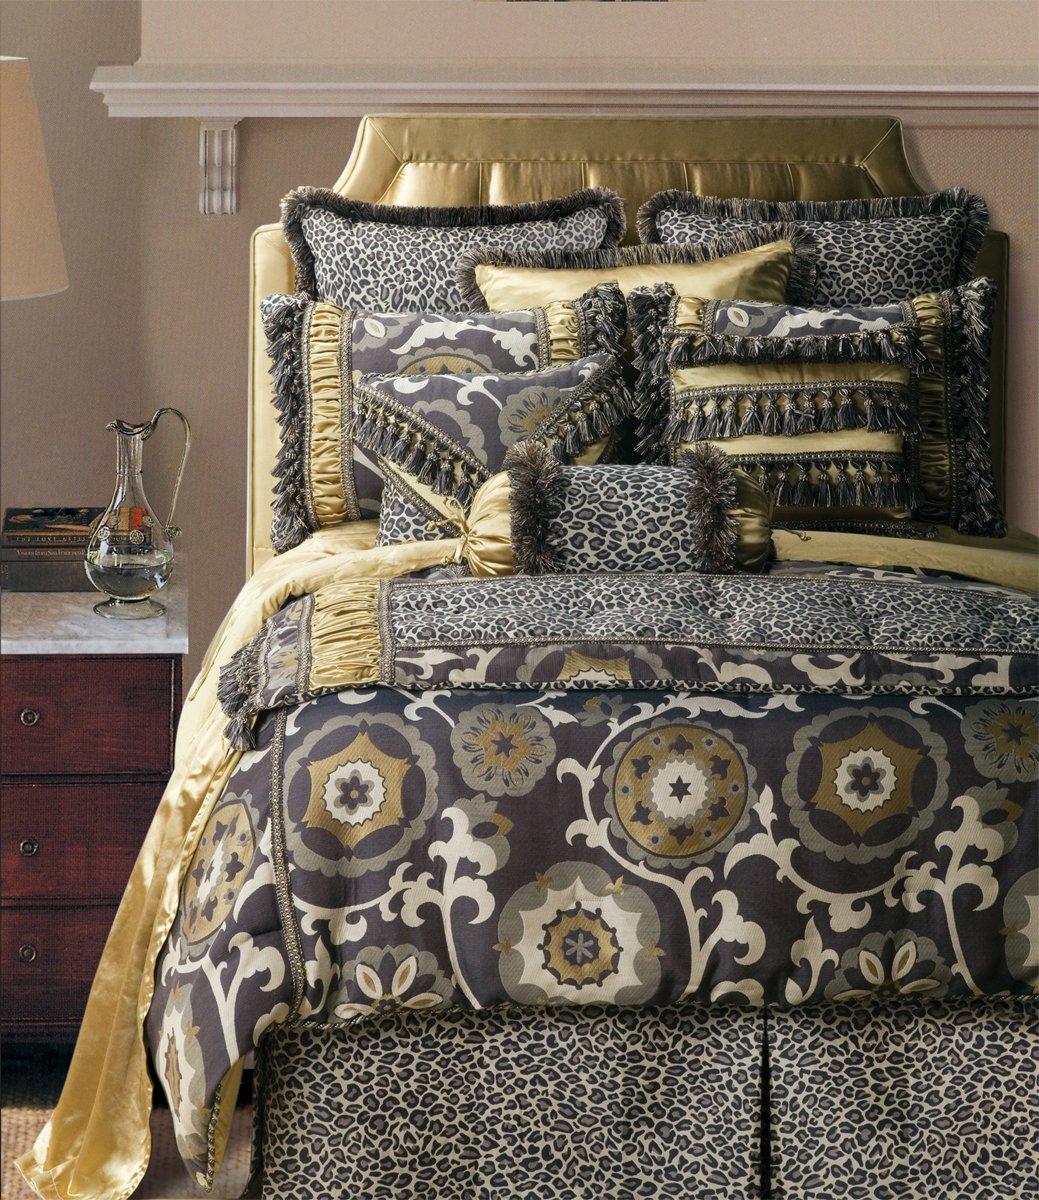 Jennifer Taylor 4 Pcs Comforter Set,Full Size, ESPRESSO Collection